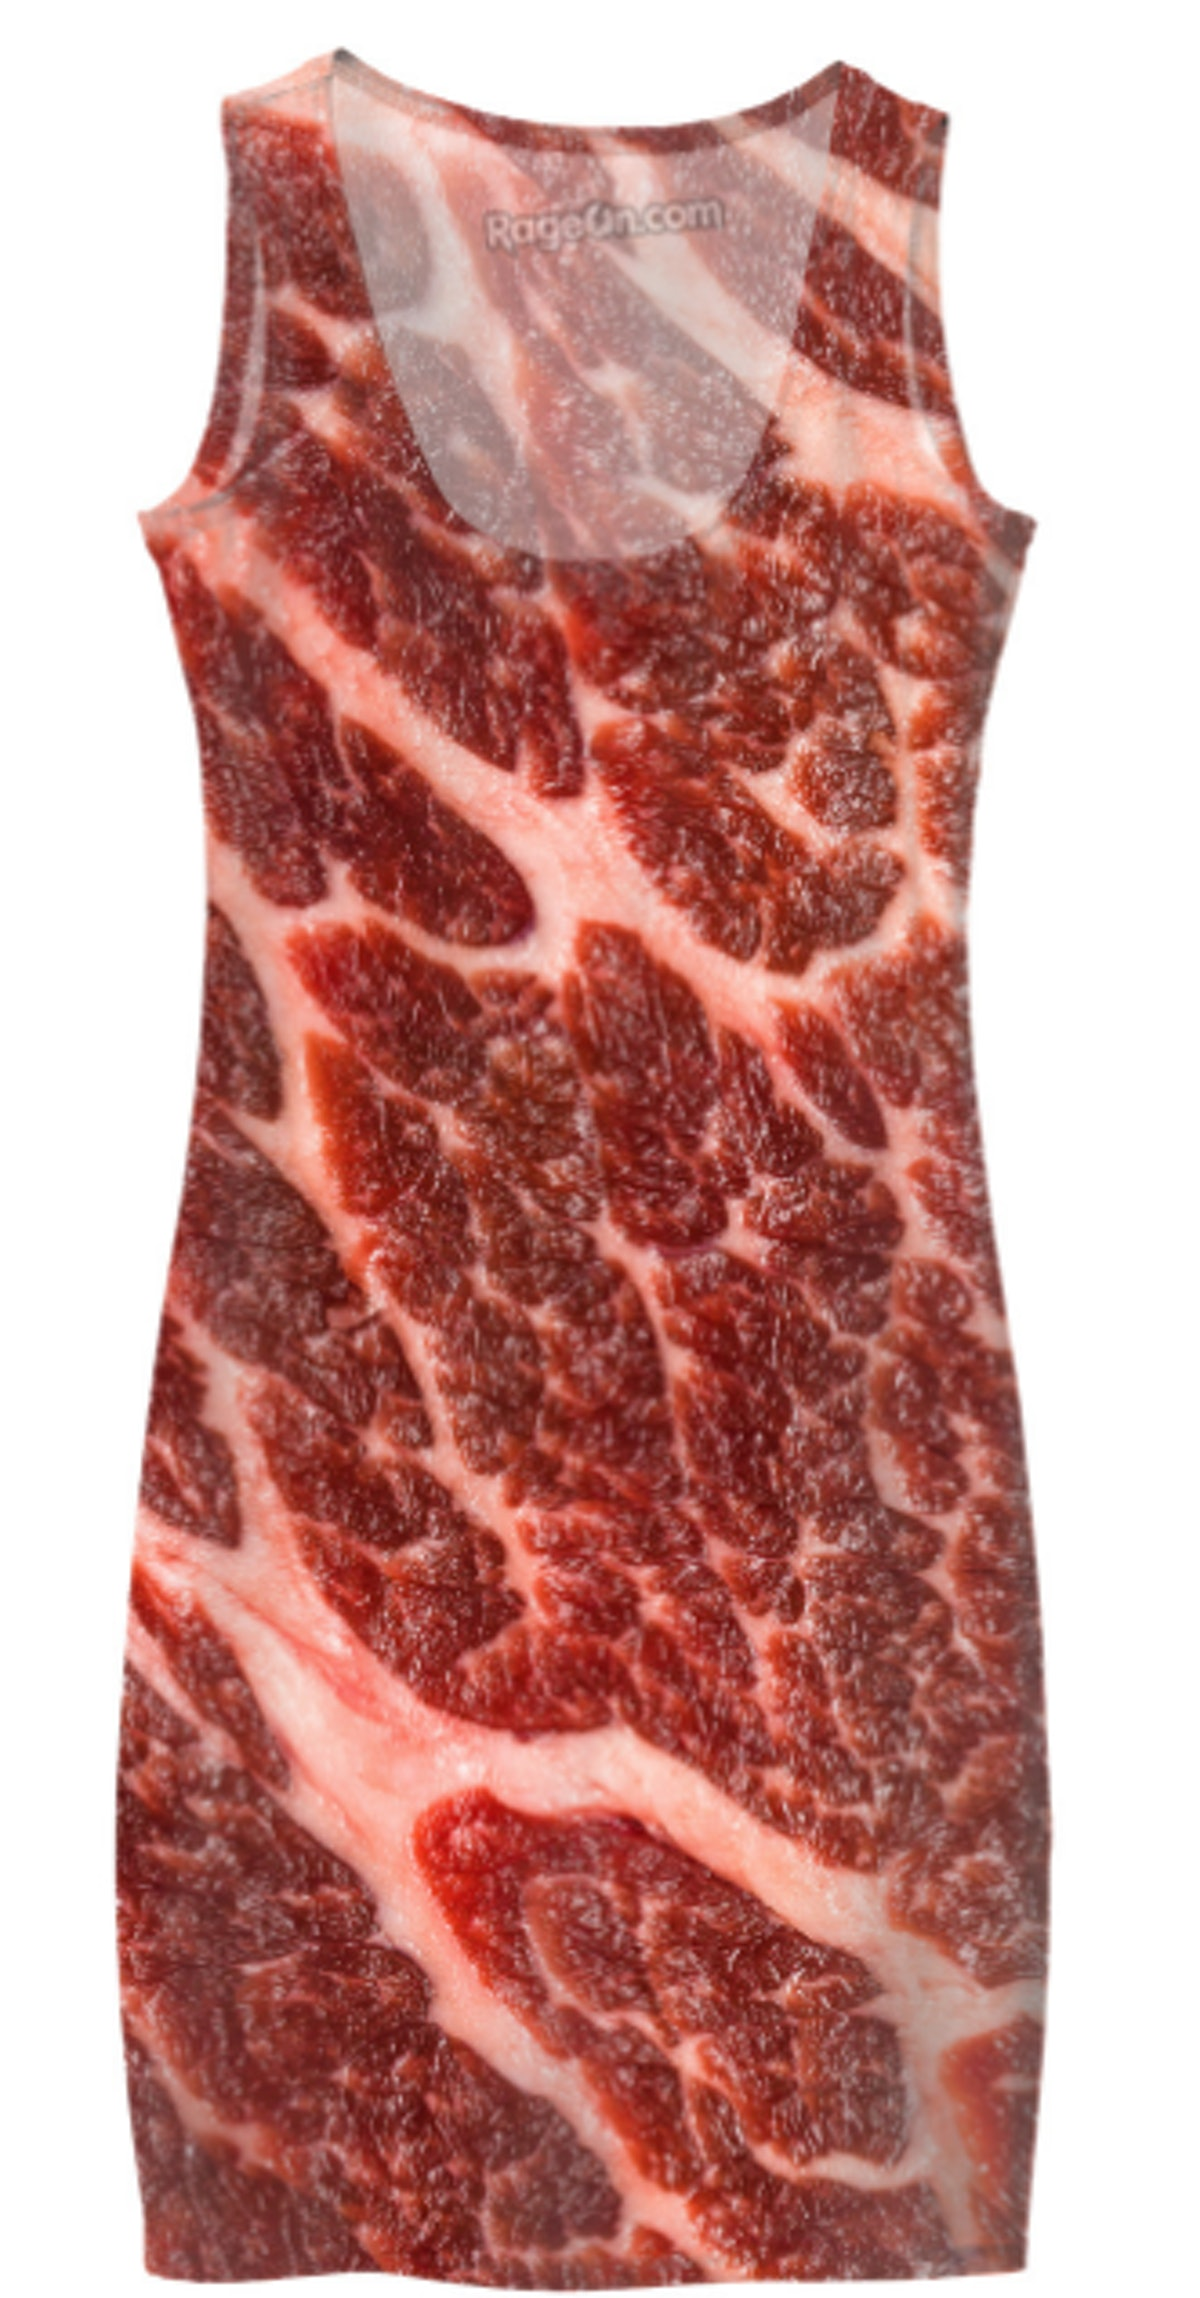 Beef Simple Dress